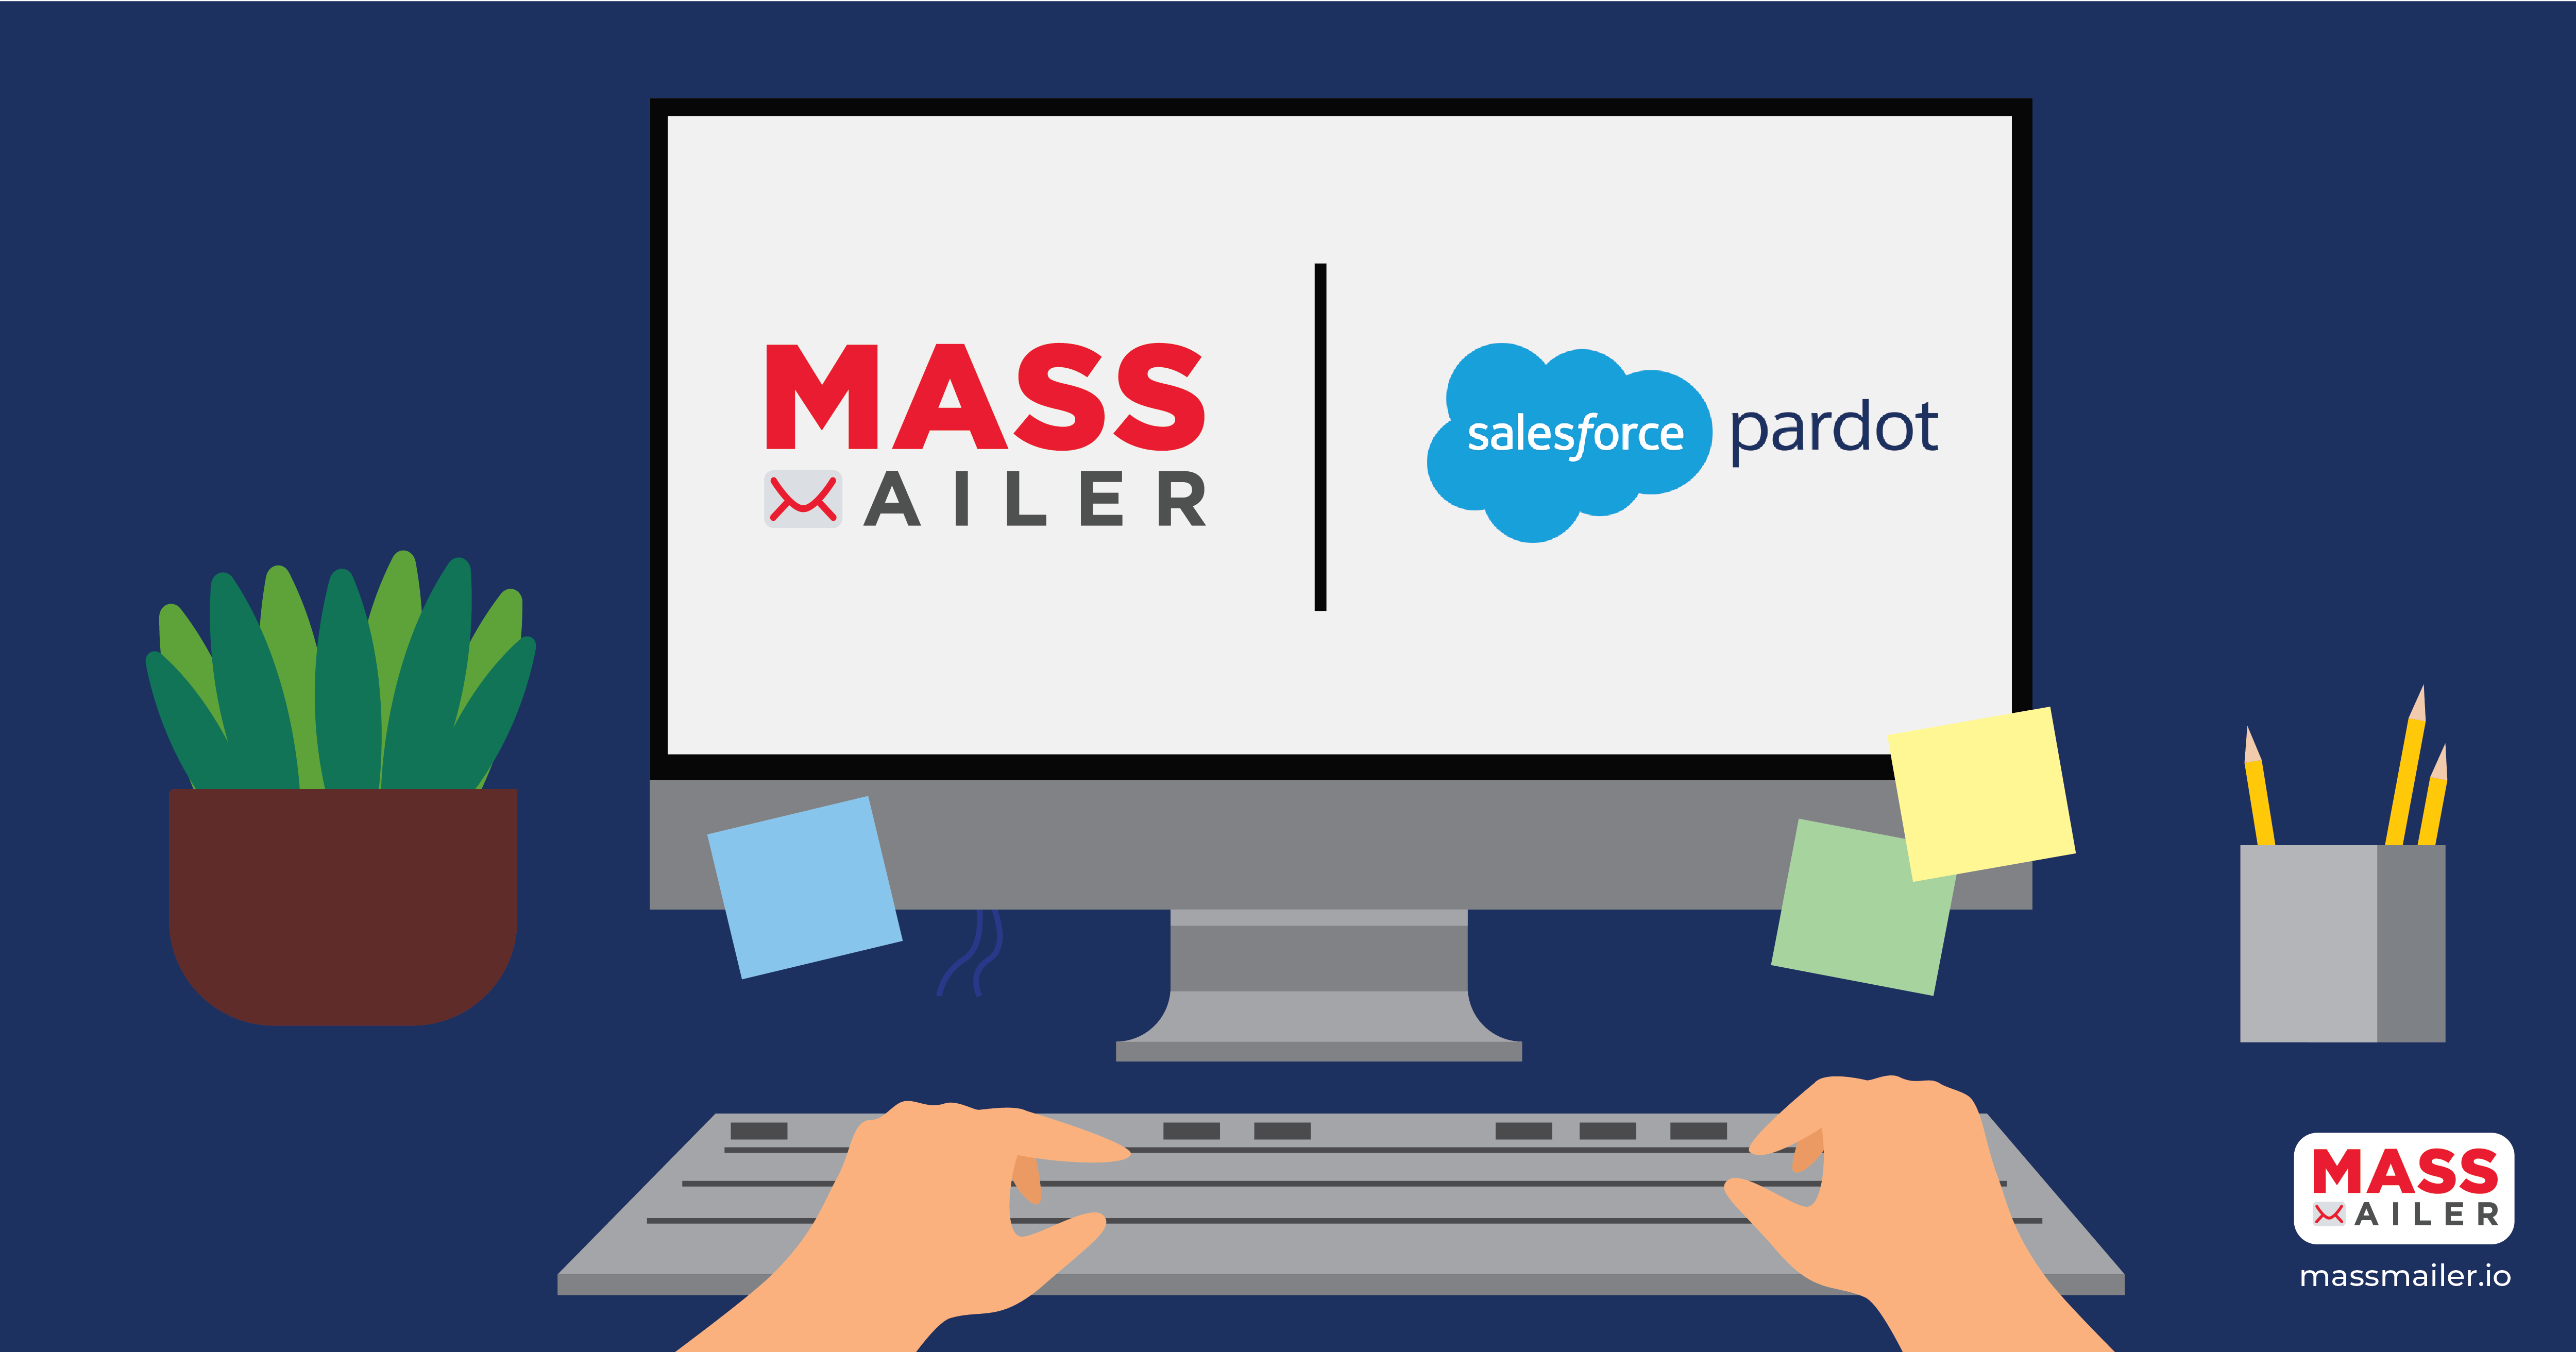 MassMailer vs Pardot - your Salesforce email campaign options